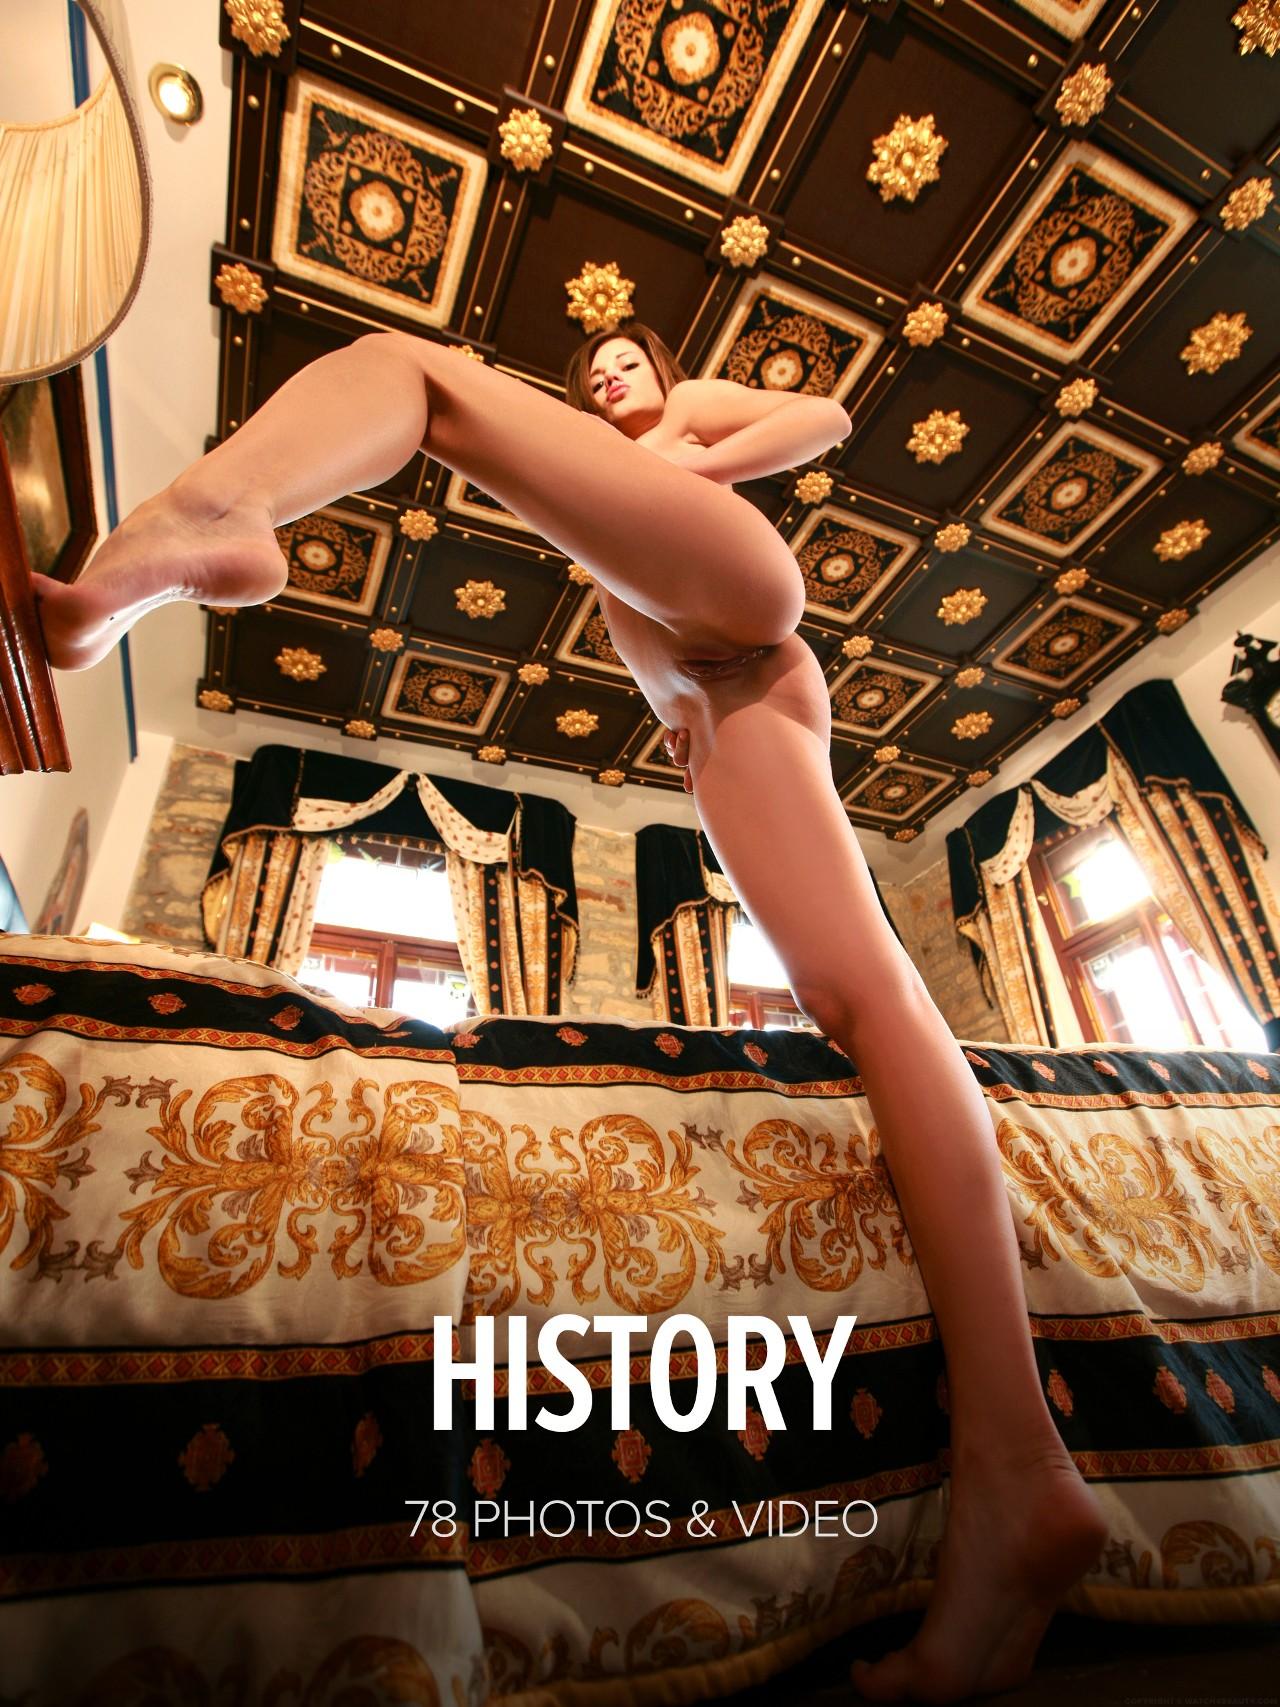 Little Caprice: History